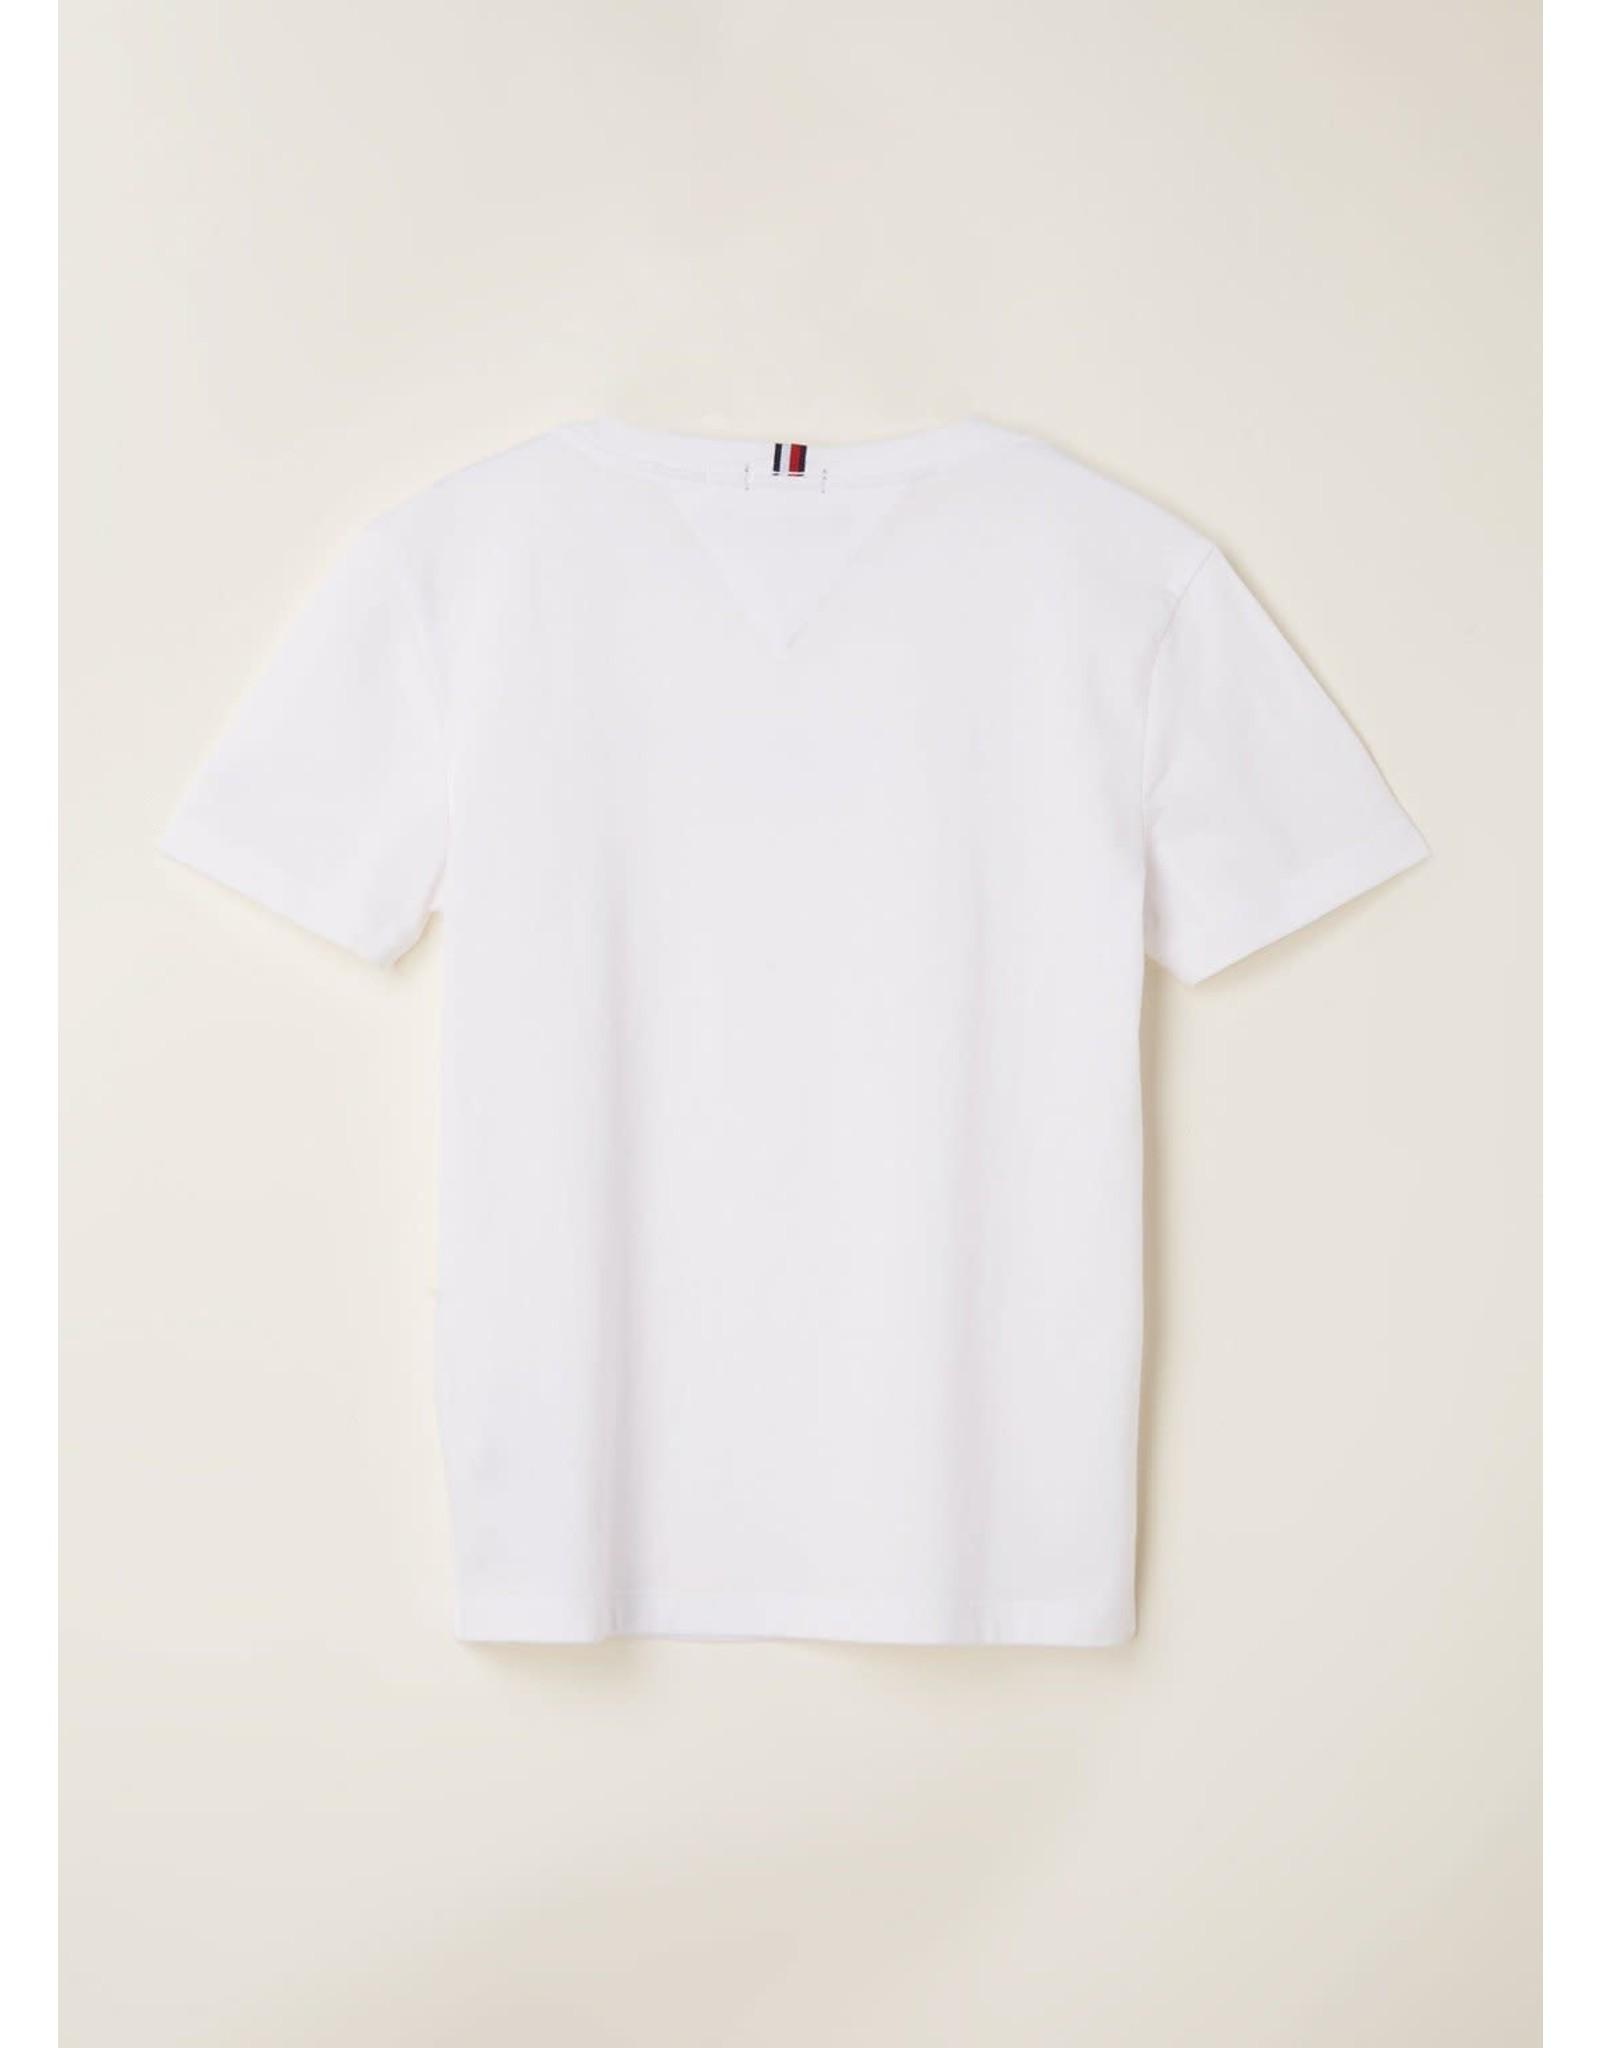 Tommy Hilfiger 5844 T-shirt